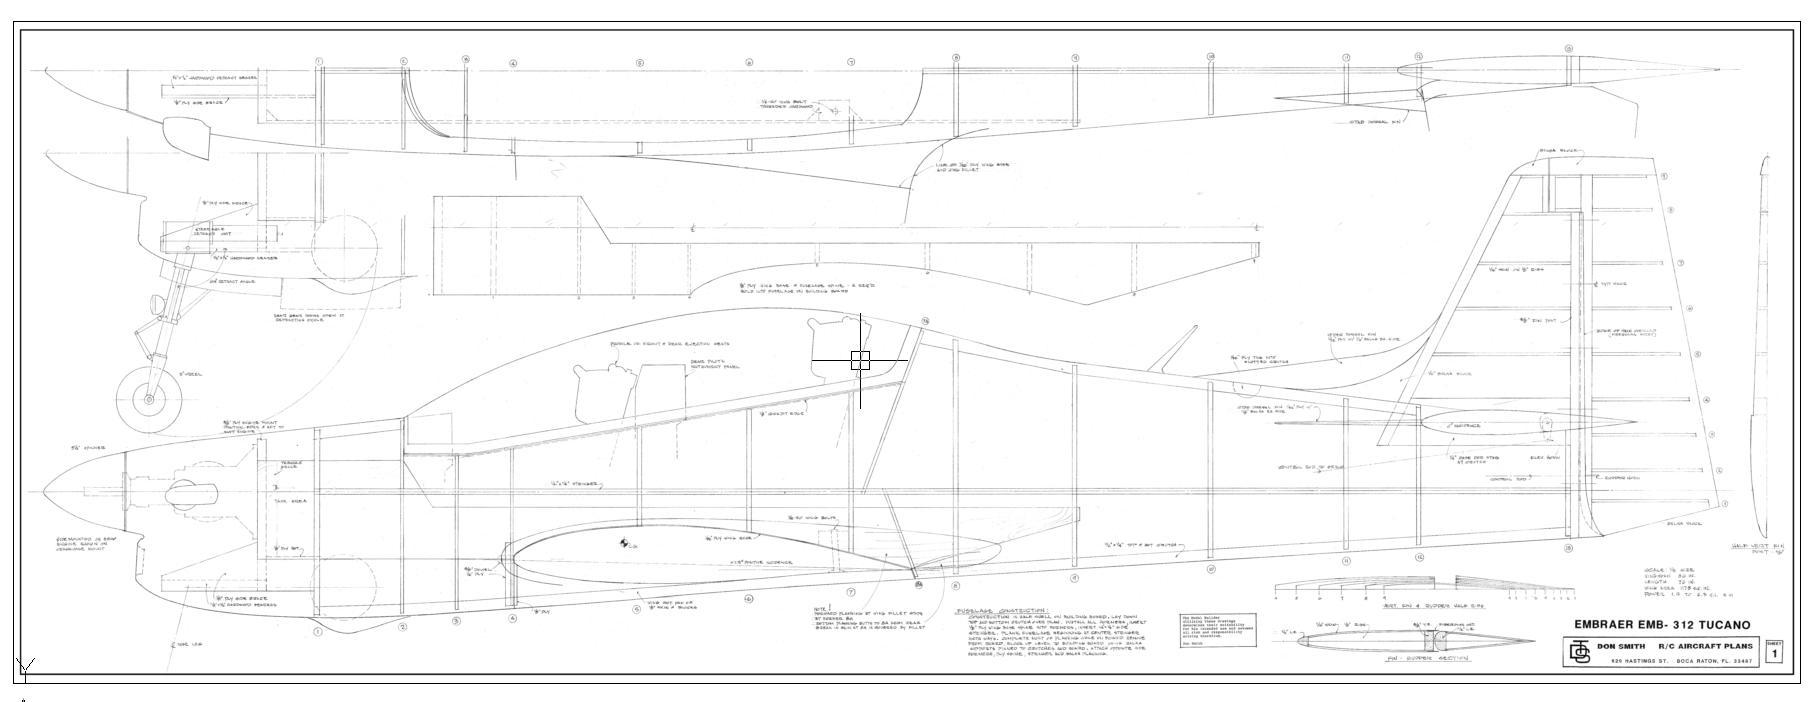 Research proposal format mla photo 1